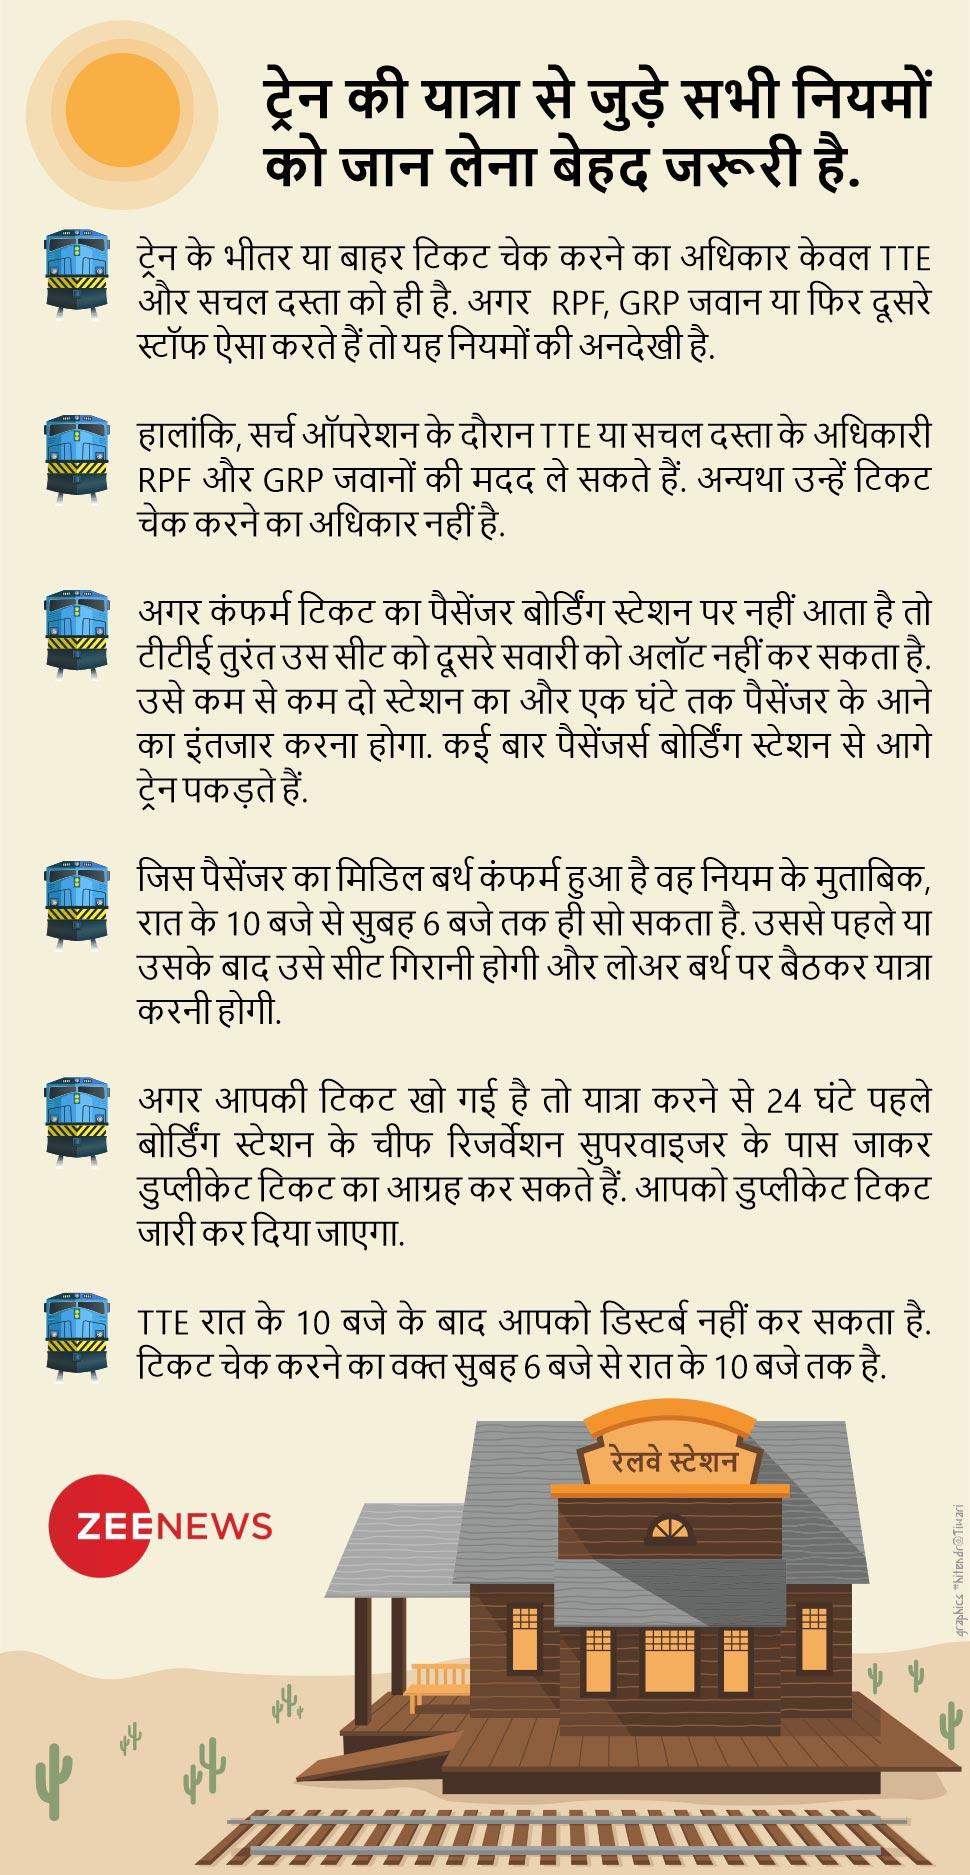 भारतीय रेलवे, indian railway, IRCTC, TTE